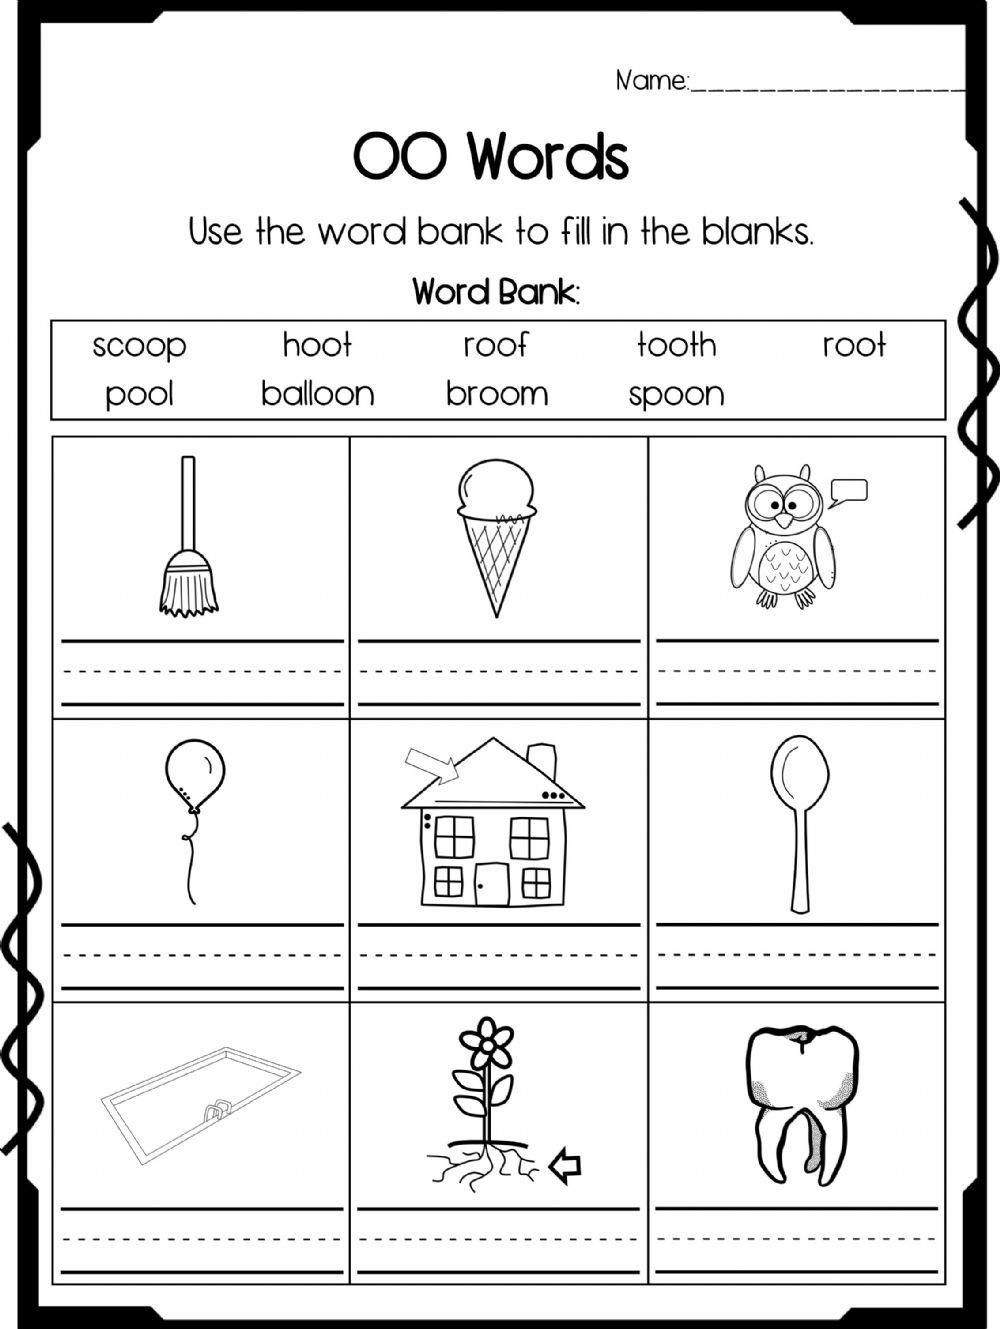 Oo Sound Interactive Worksheet In 2020 Phonics Worksheets Oo Words Phonics